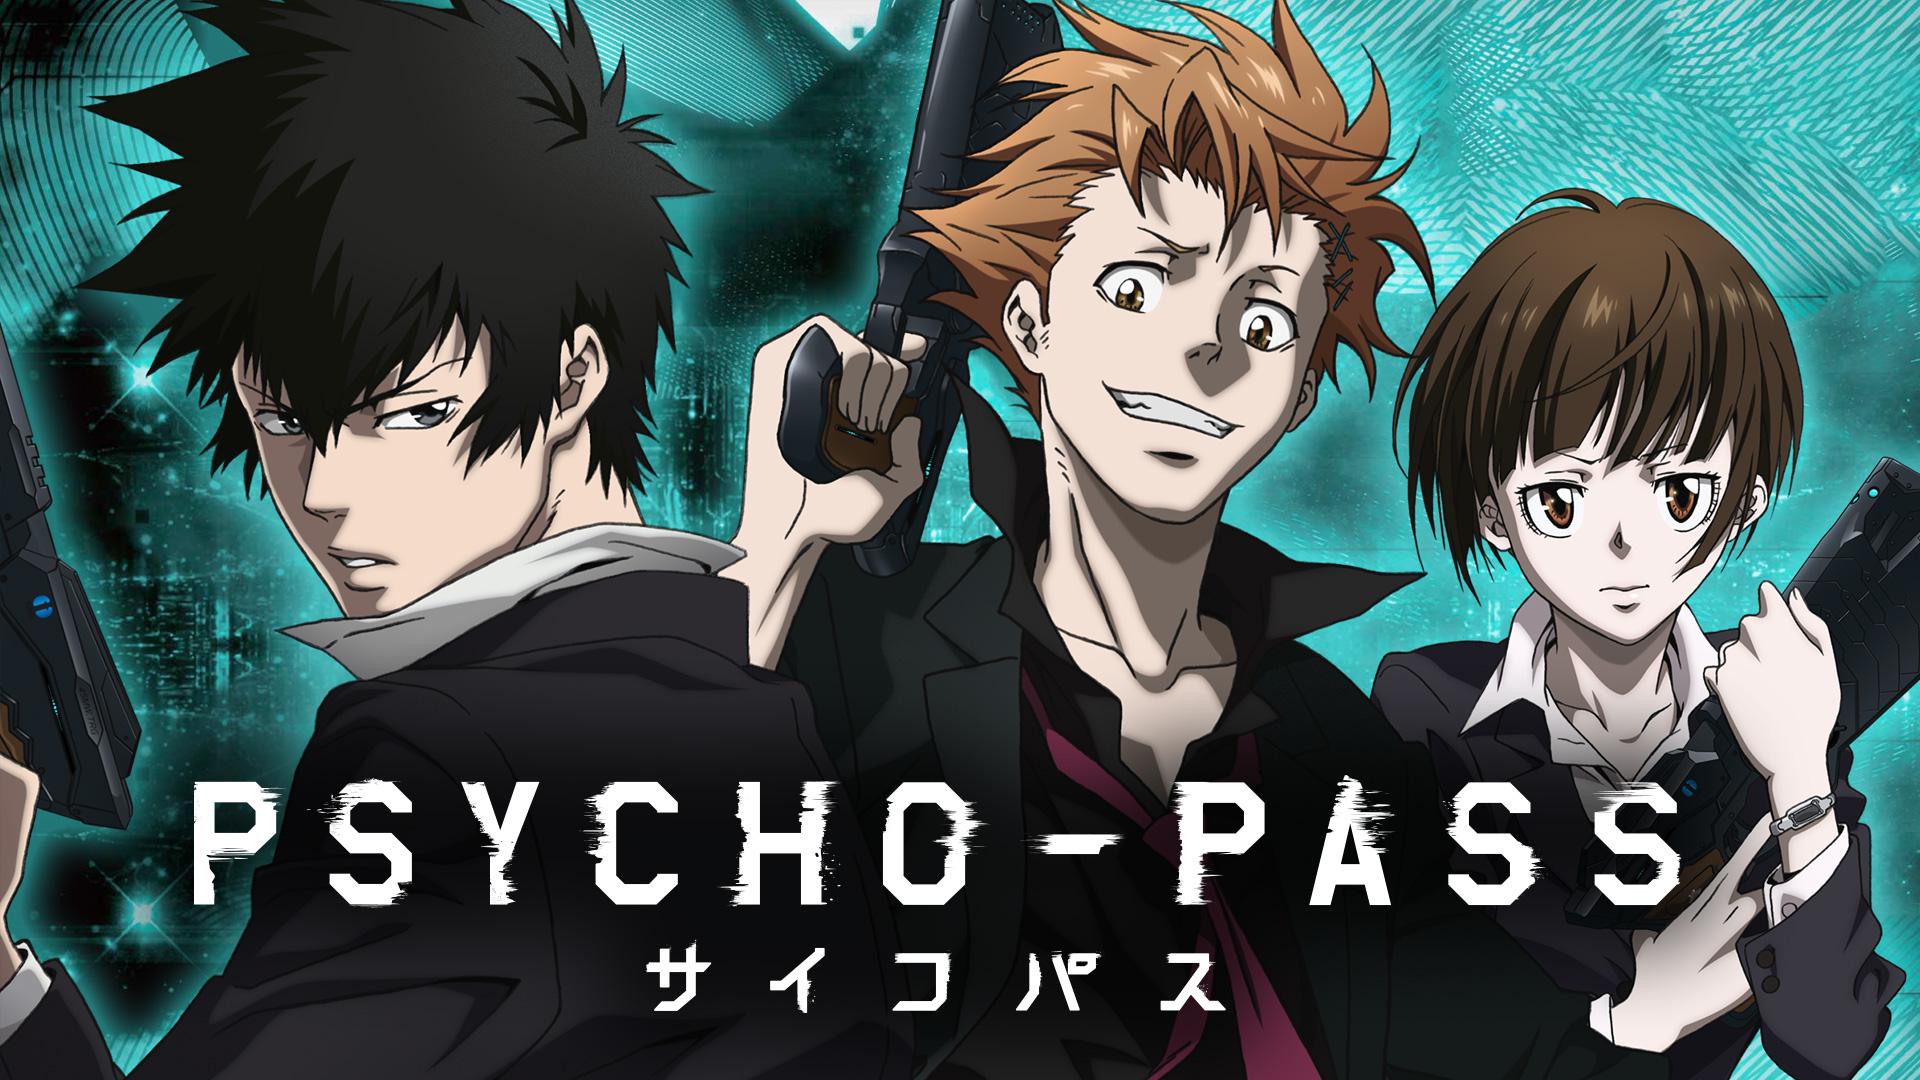 PSYCHO-PASS Season 1